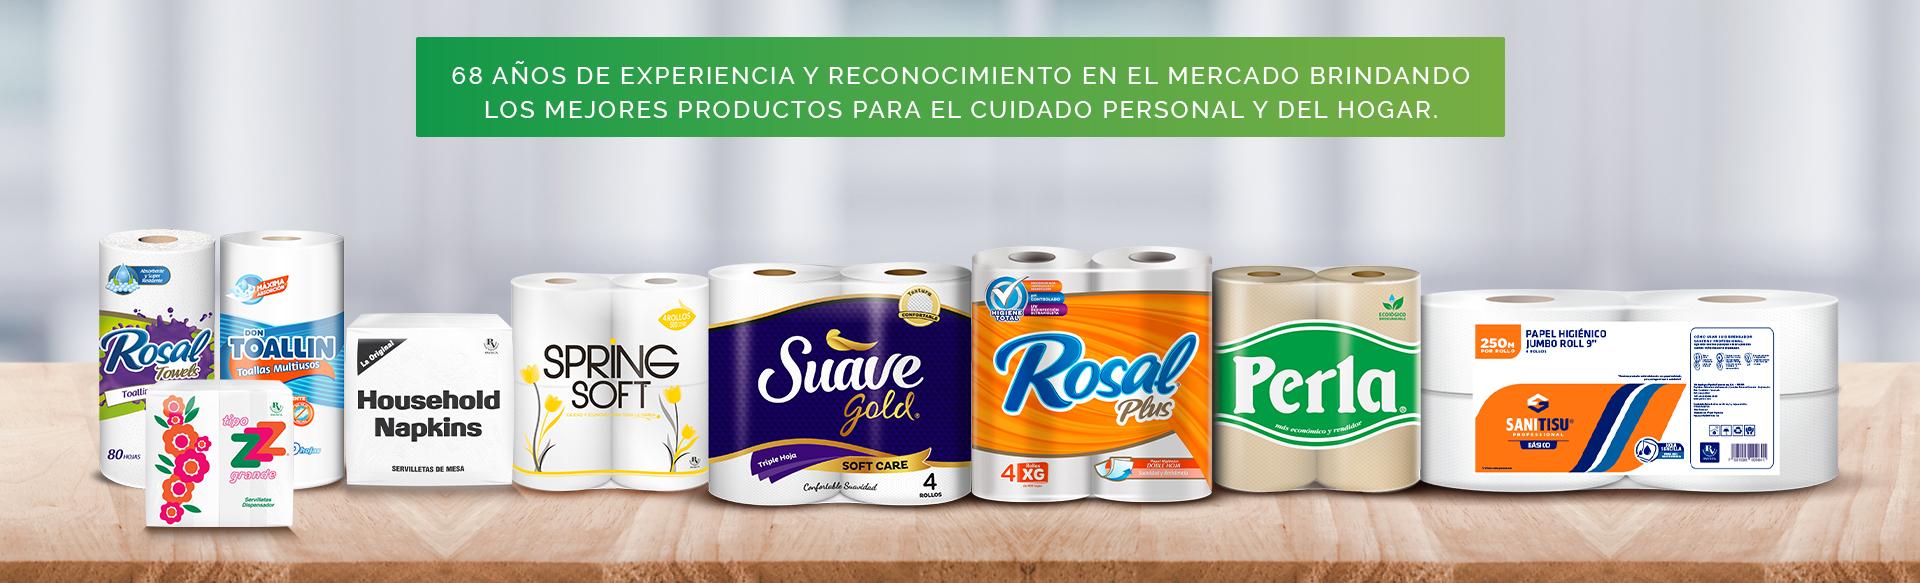 Banner Productos en General-Home